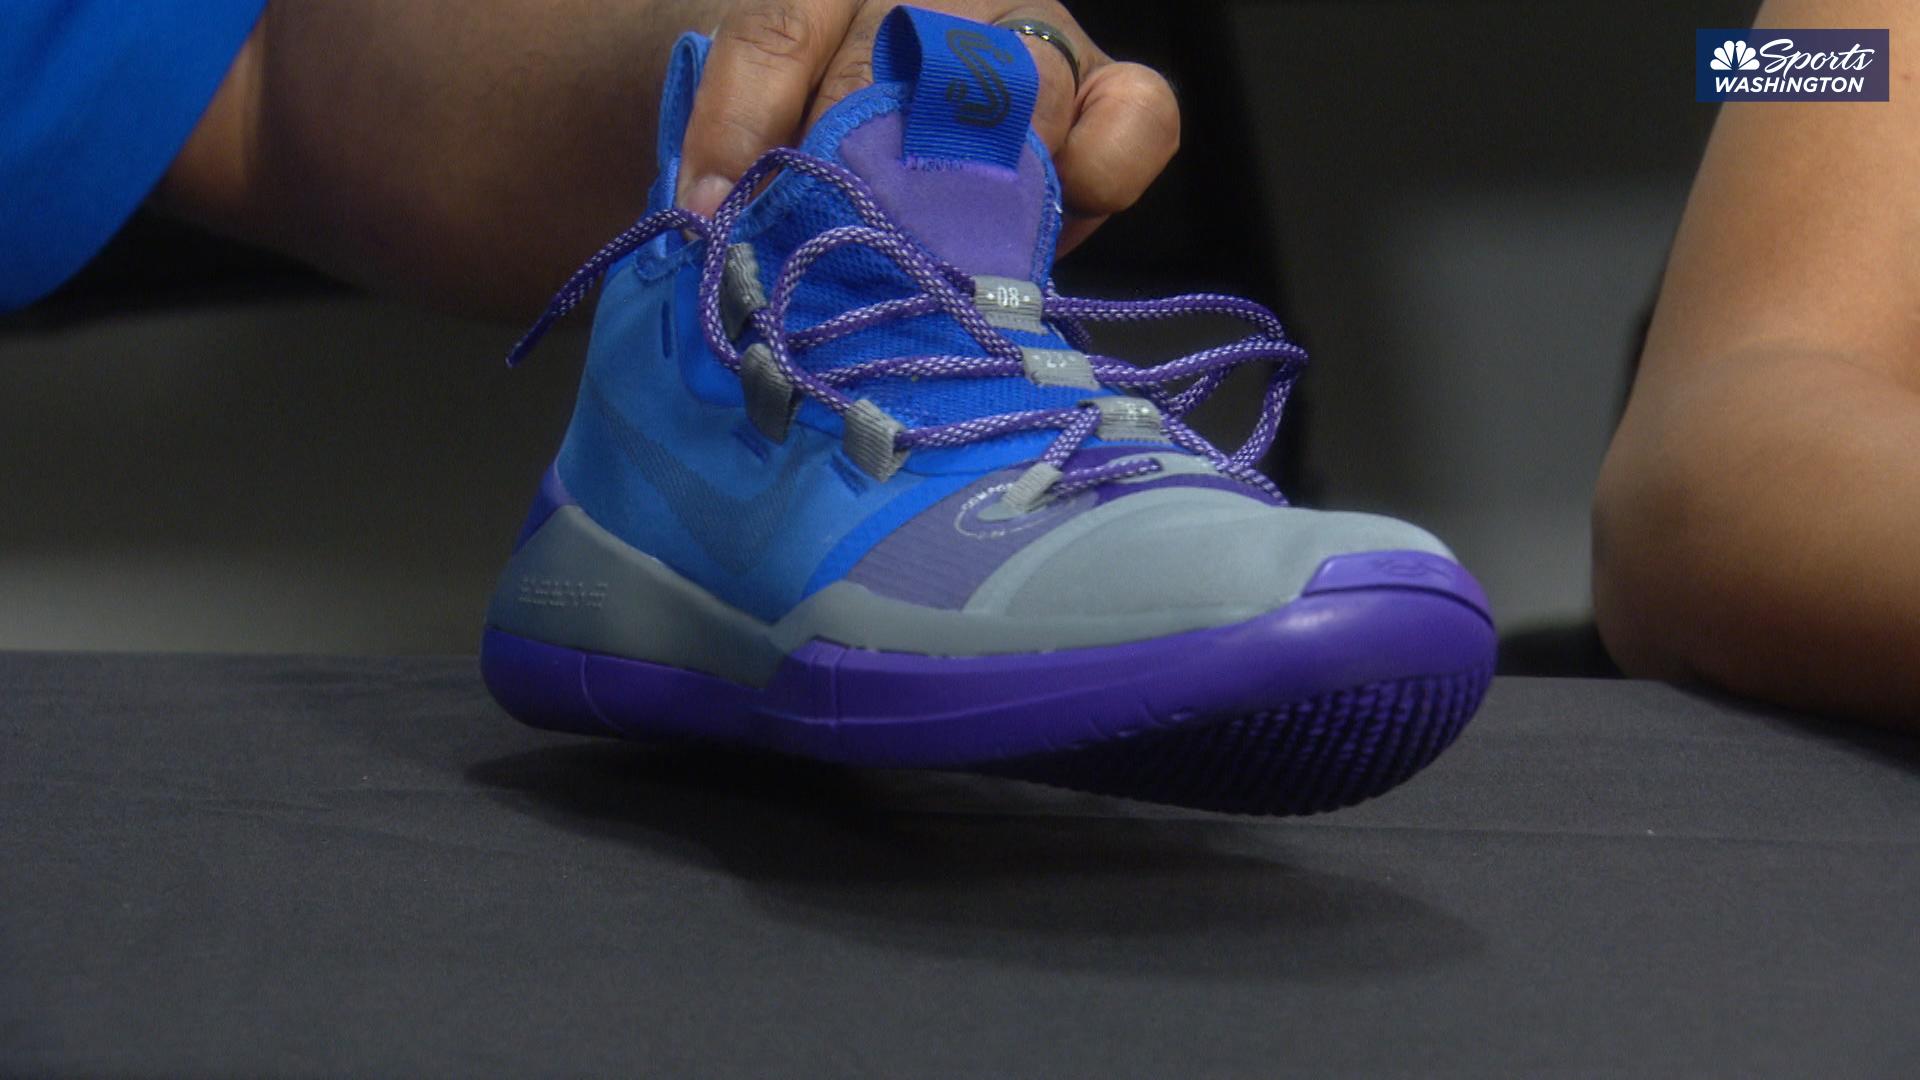 Wizards' coach Scott Brooks designs sneaker for Mystics' Kristi Toliver